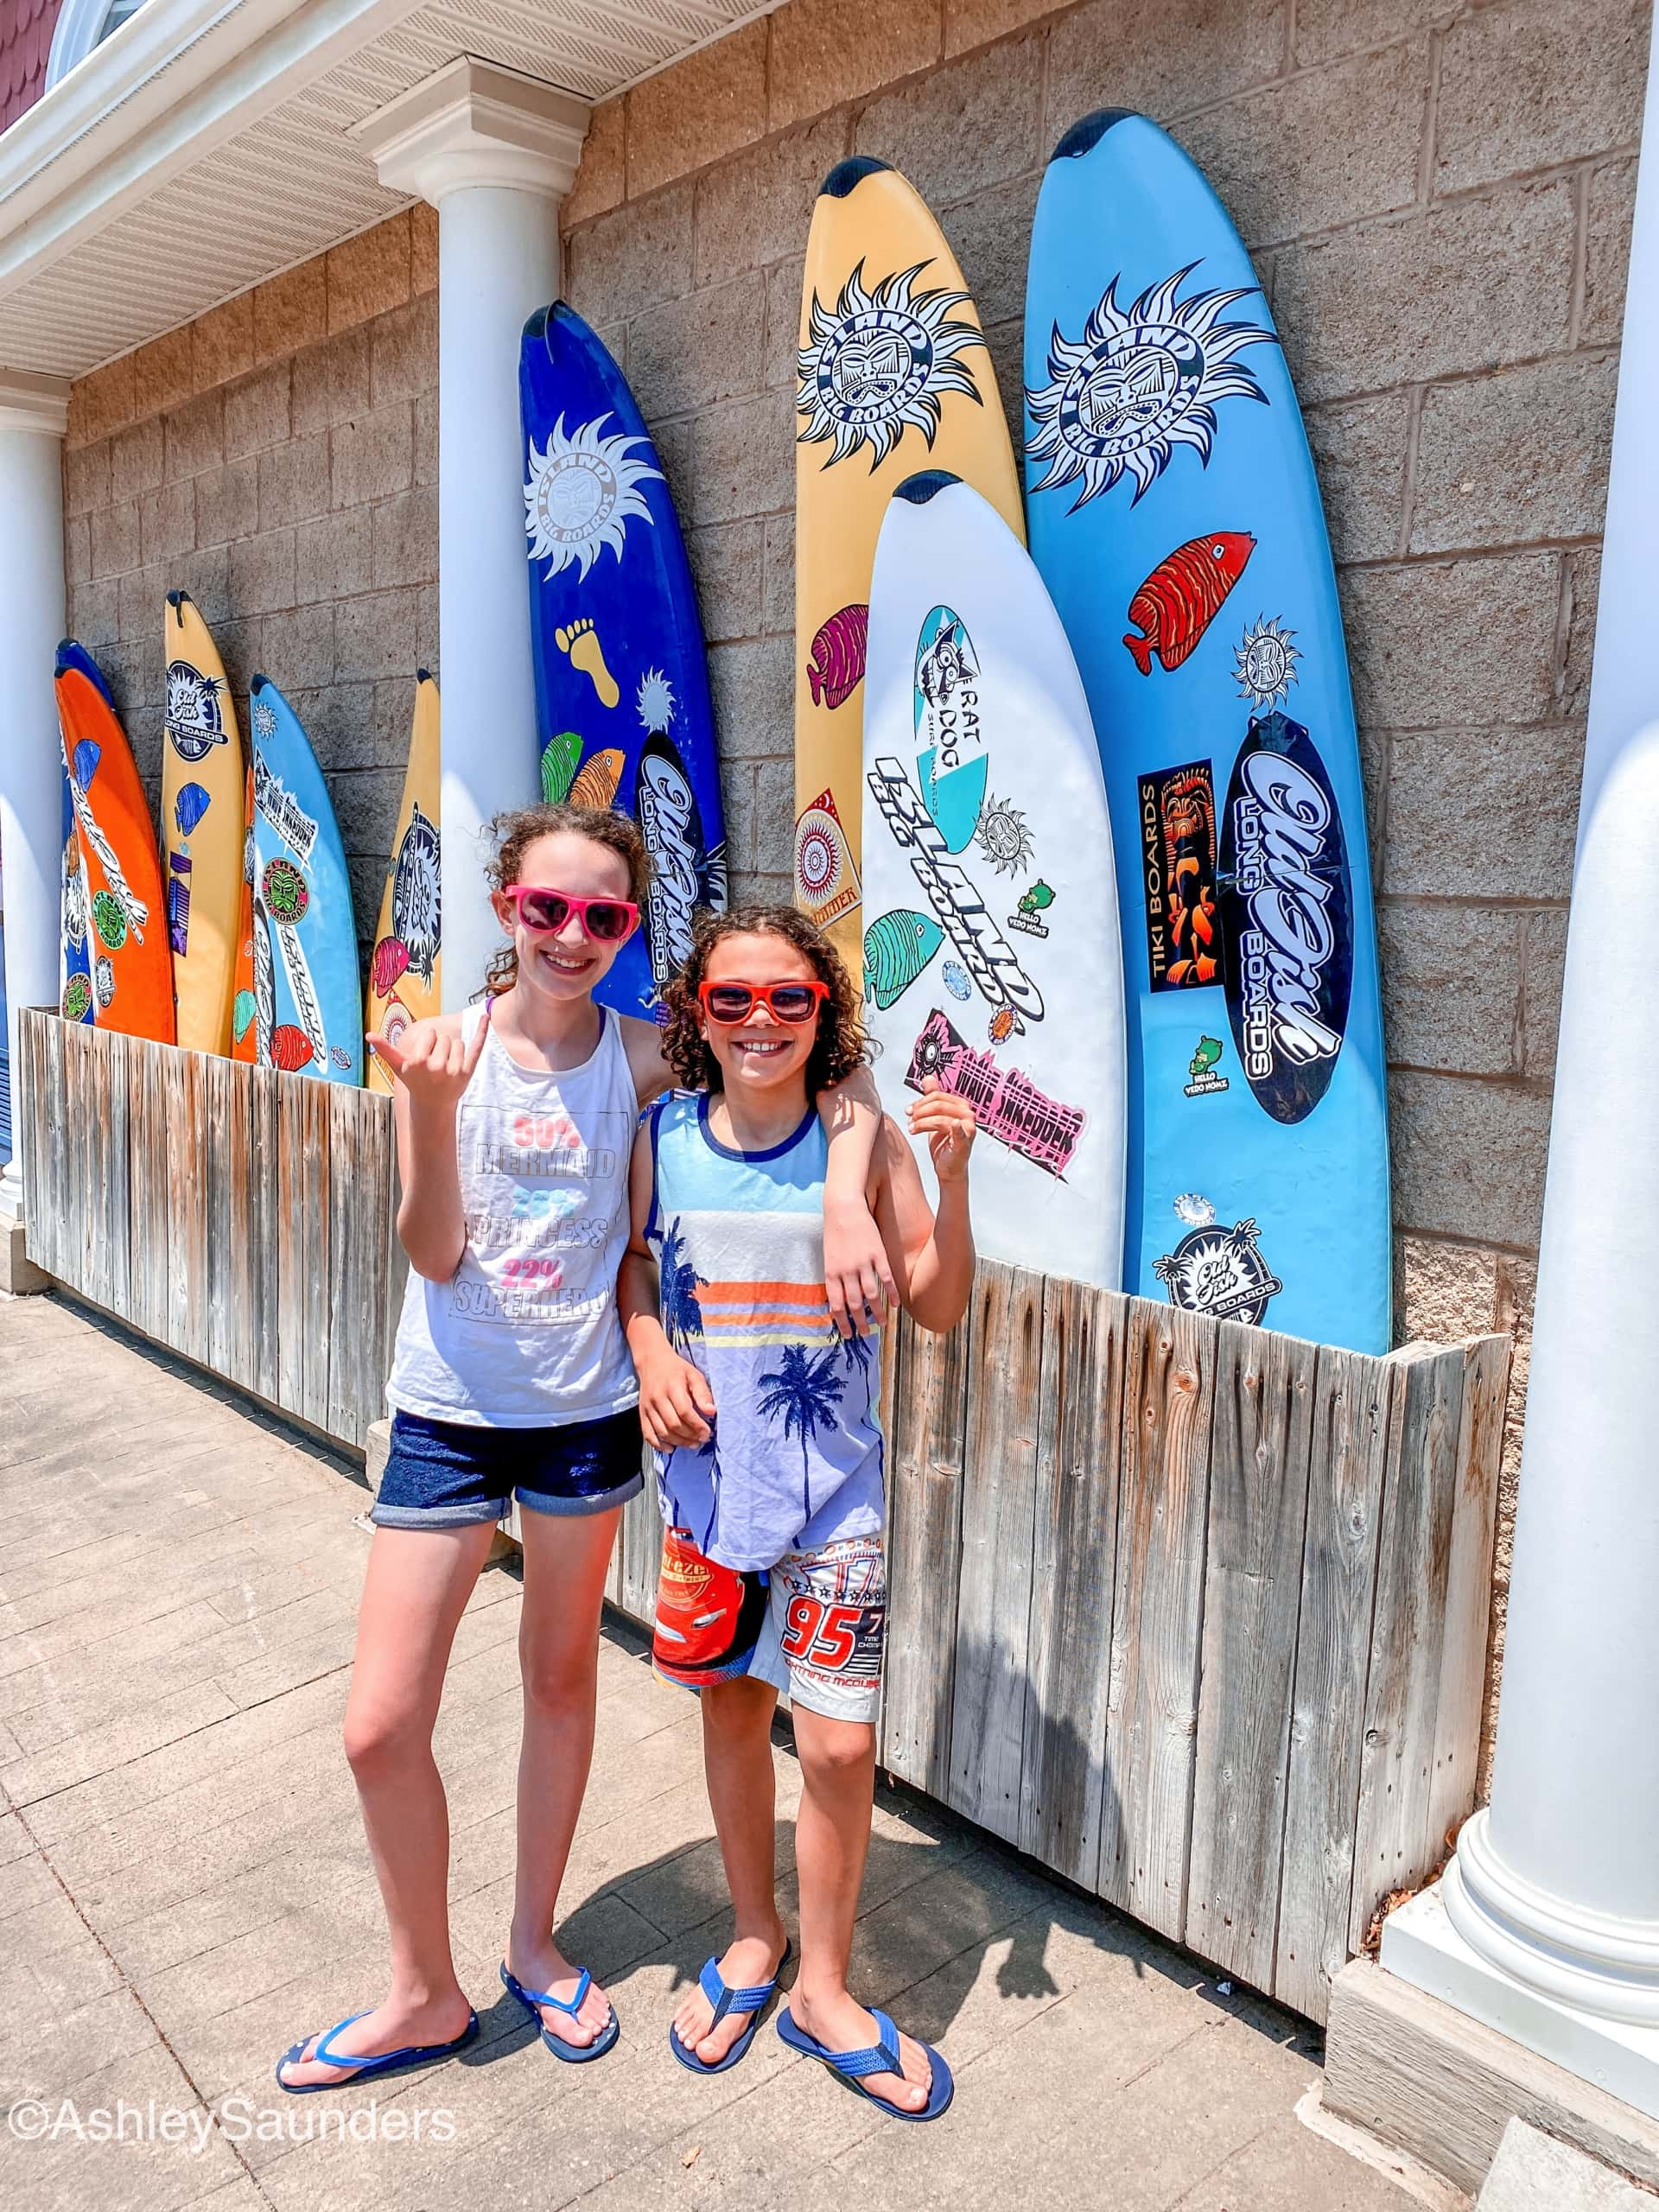 Visiting Hersheypark in 2020 Boardwalk